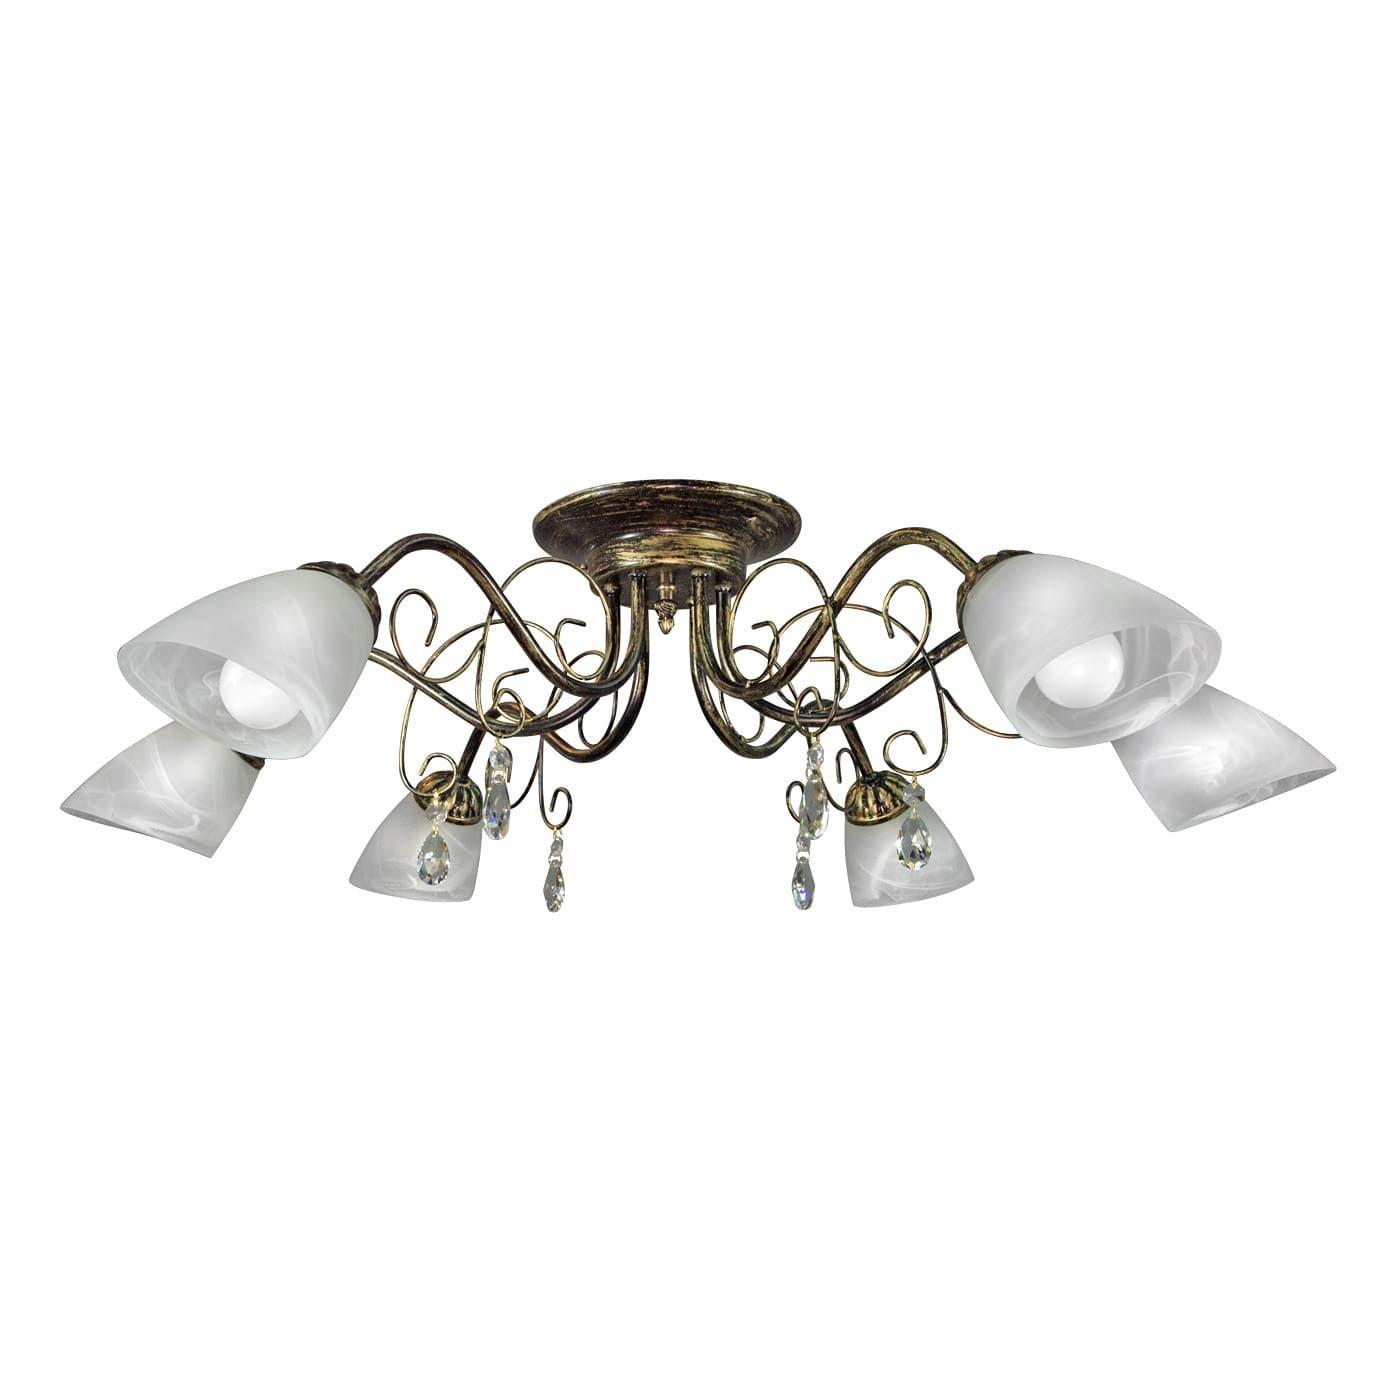 PETRASVET / Ceiling chandelier S2374-6, 6xE14 max. 60W